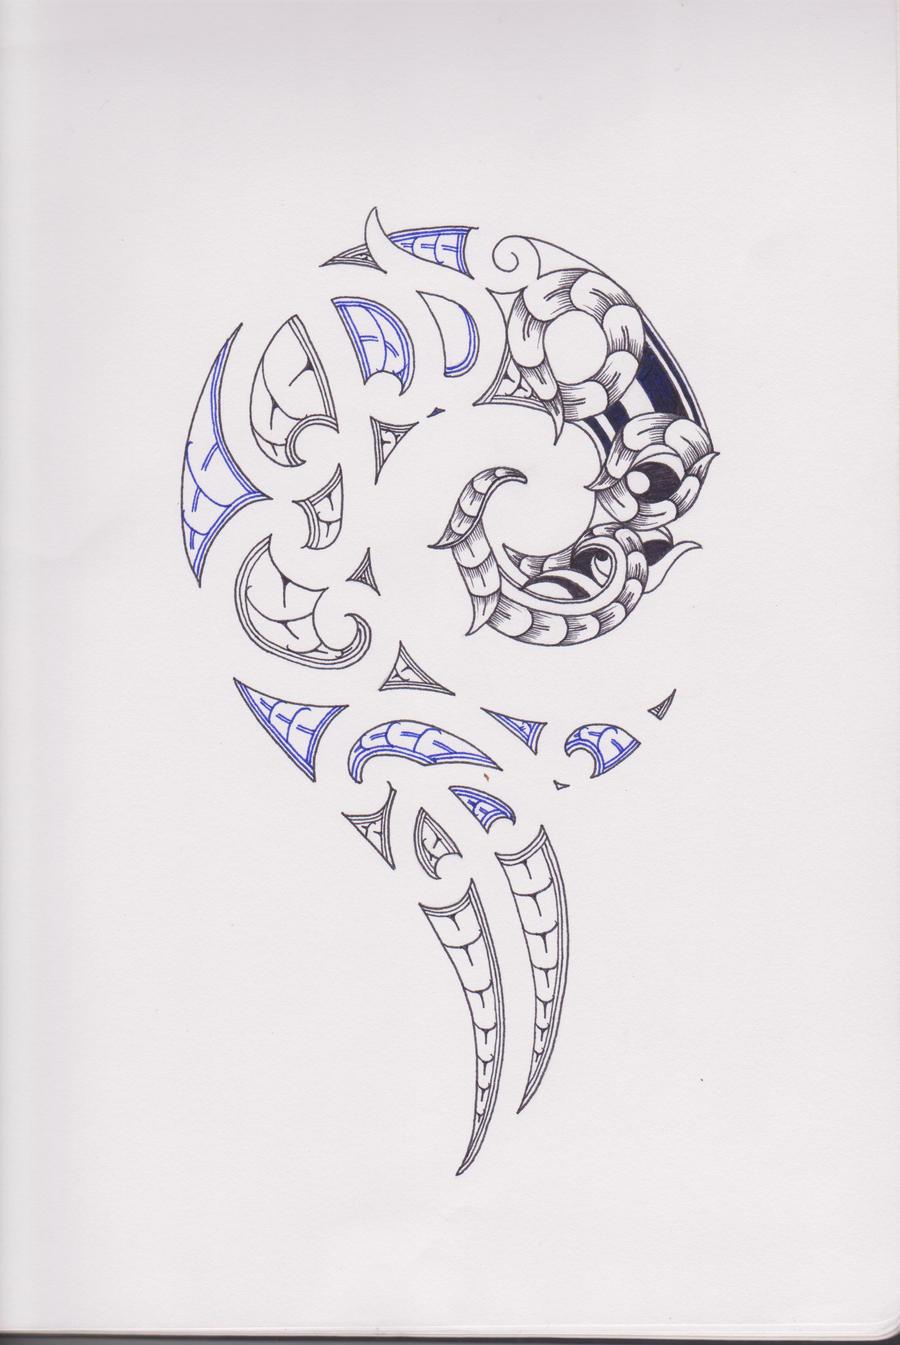 tattoo ta moko by bloodempire designs interfaces tattoo design 2012 ...